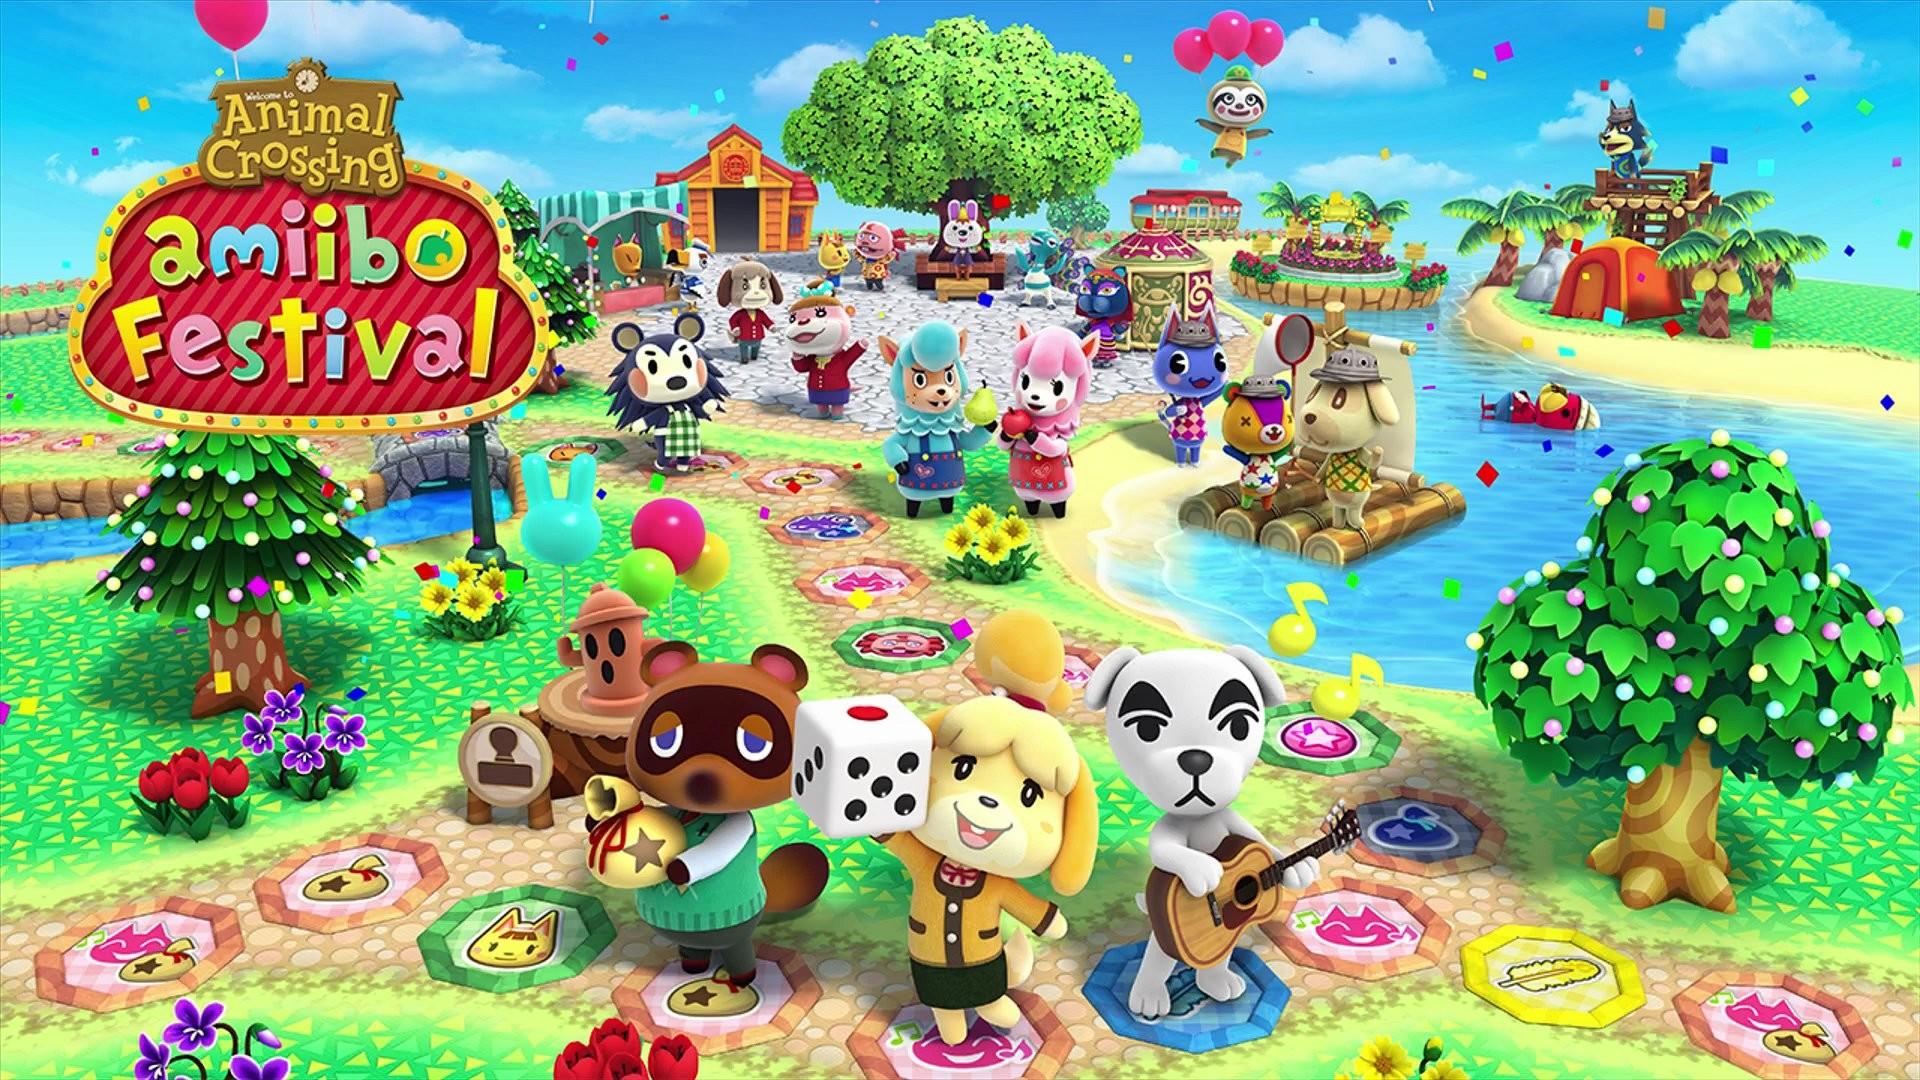 Video Game – Animal Crossing: Amiibo Festival Wallpaper